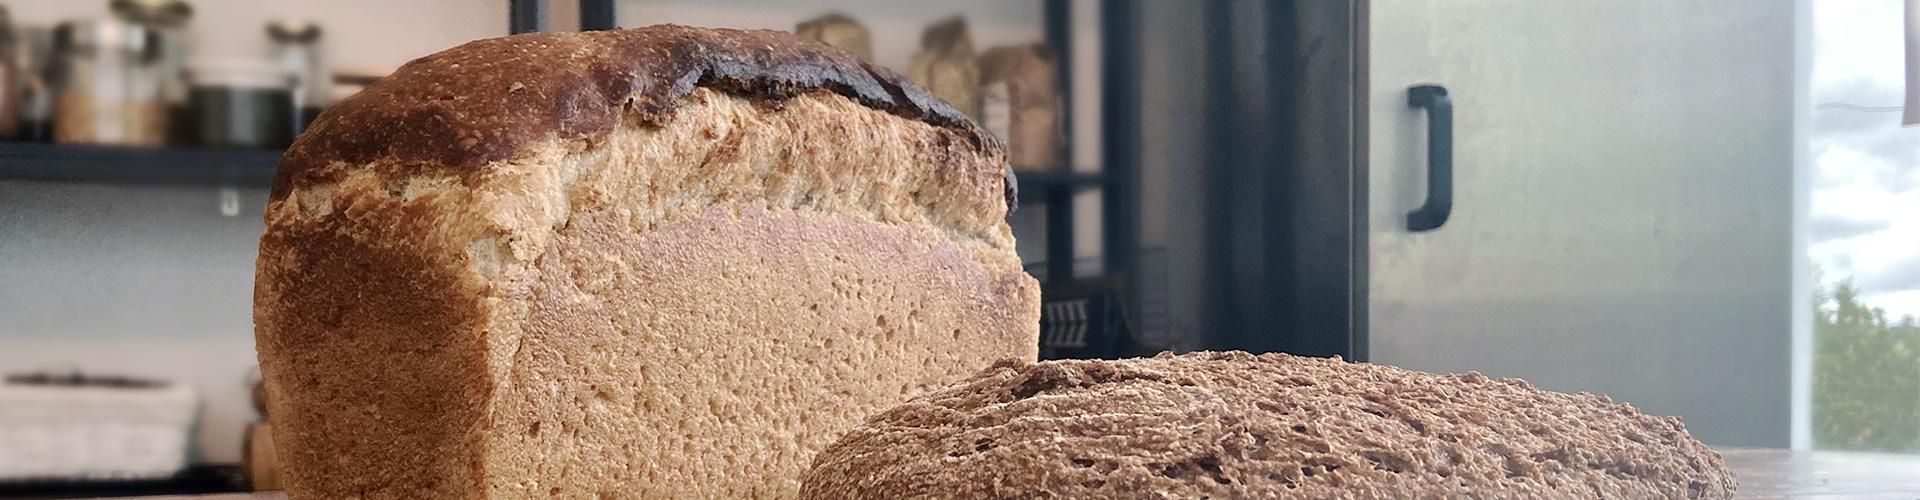 Busbrood met planbrood - Top of Flop - Marije Bakt Brood